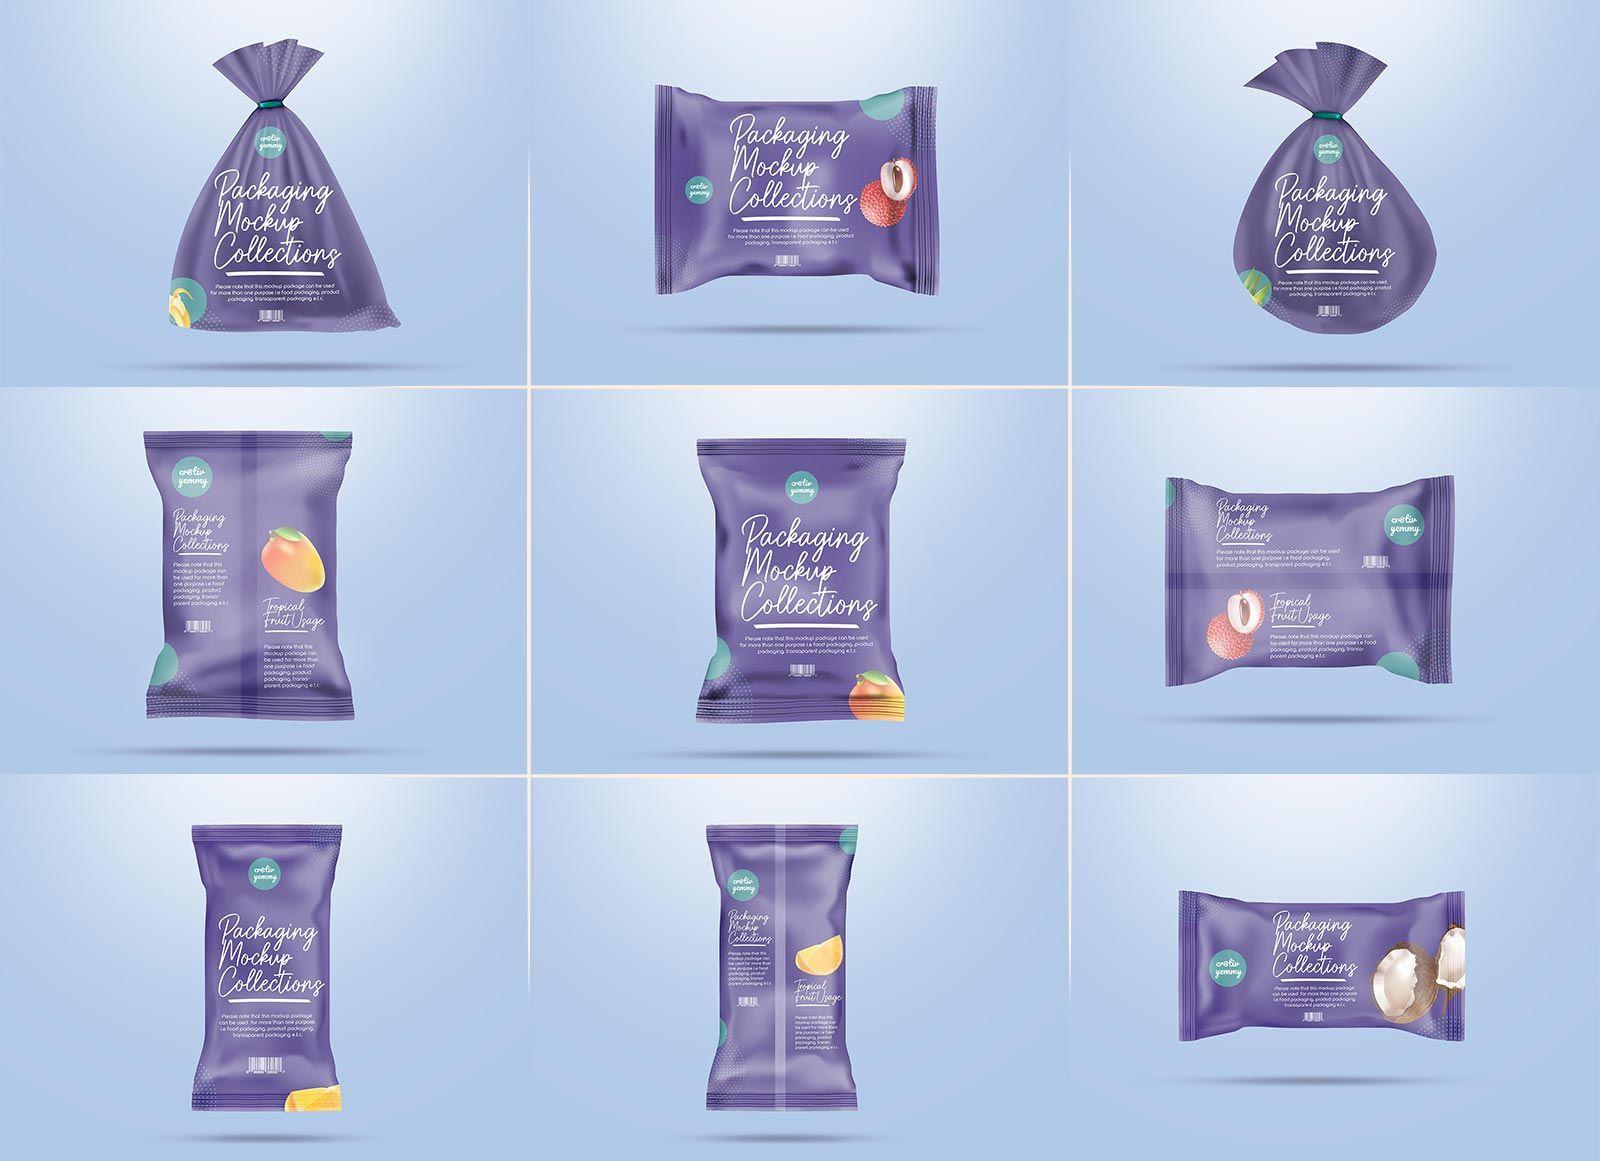 Download 10 Free Gunny Sack Bag Snack Pack Packaging Mockup Psd Set Snack Packs Packaging Mockup Snack Bags